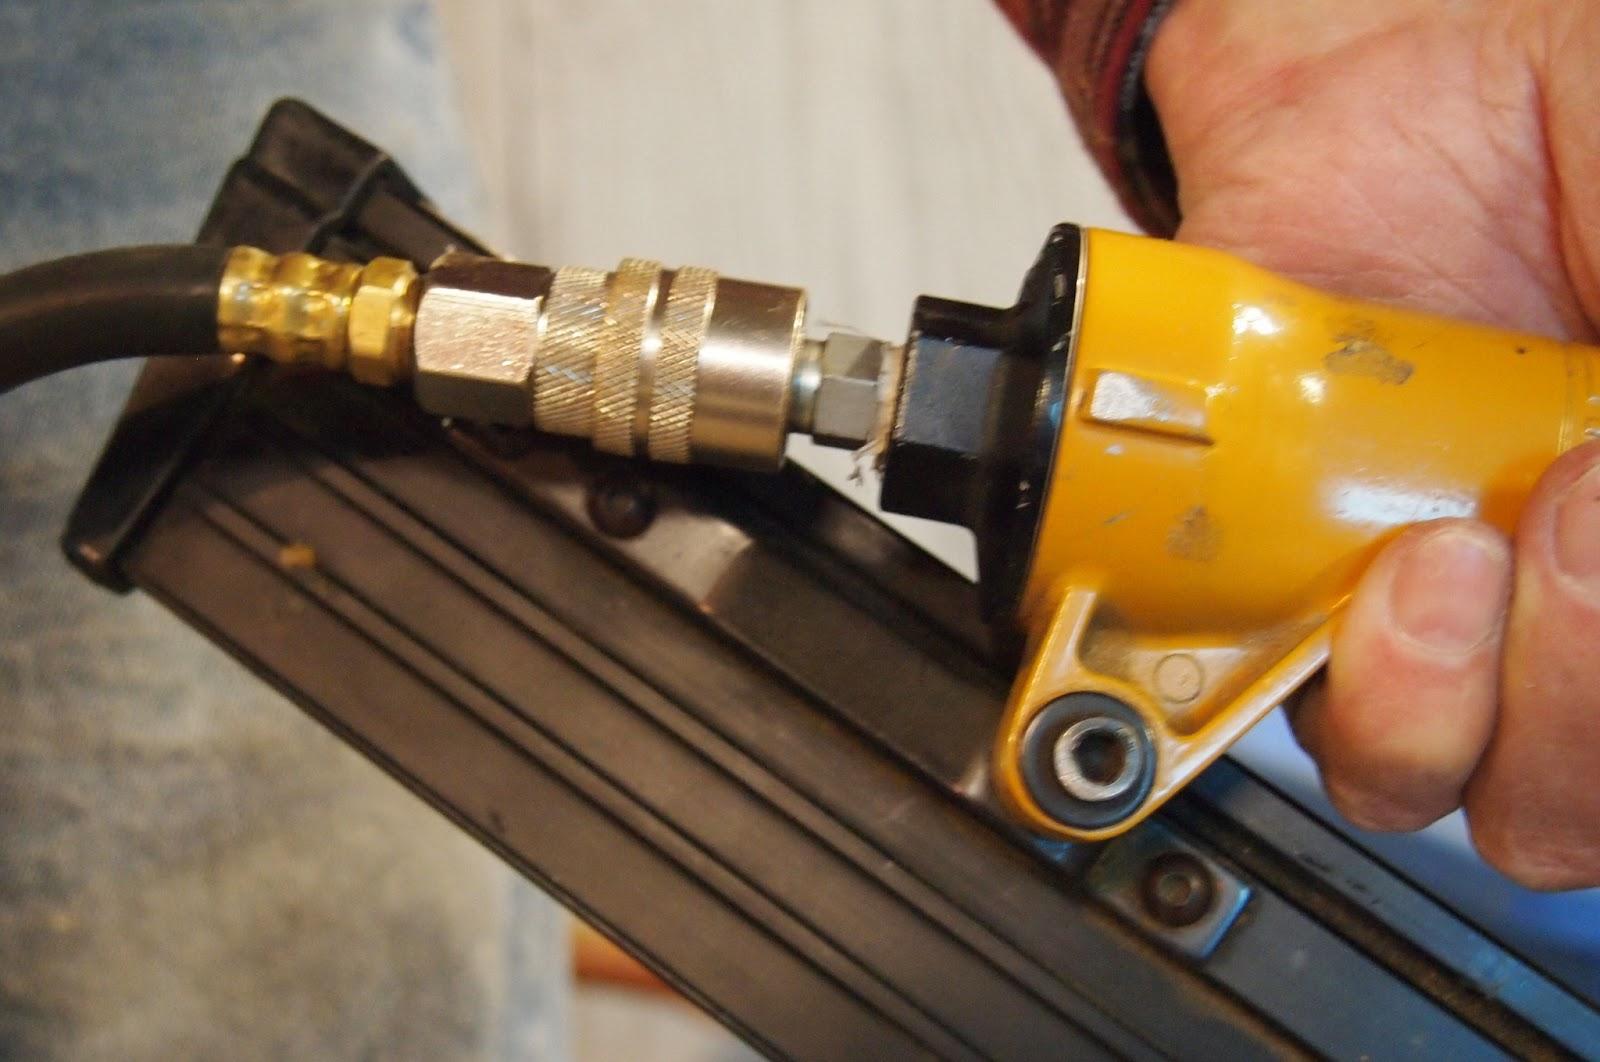 How to Build a Canvas Stretcher: 19. Attach hose to nail gun